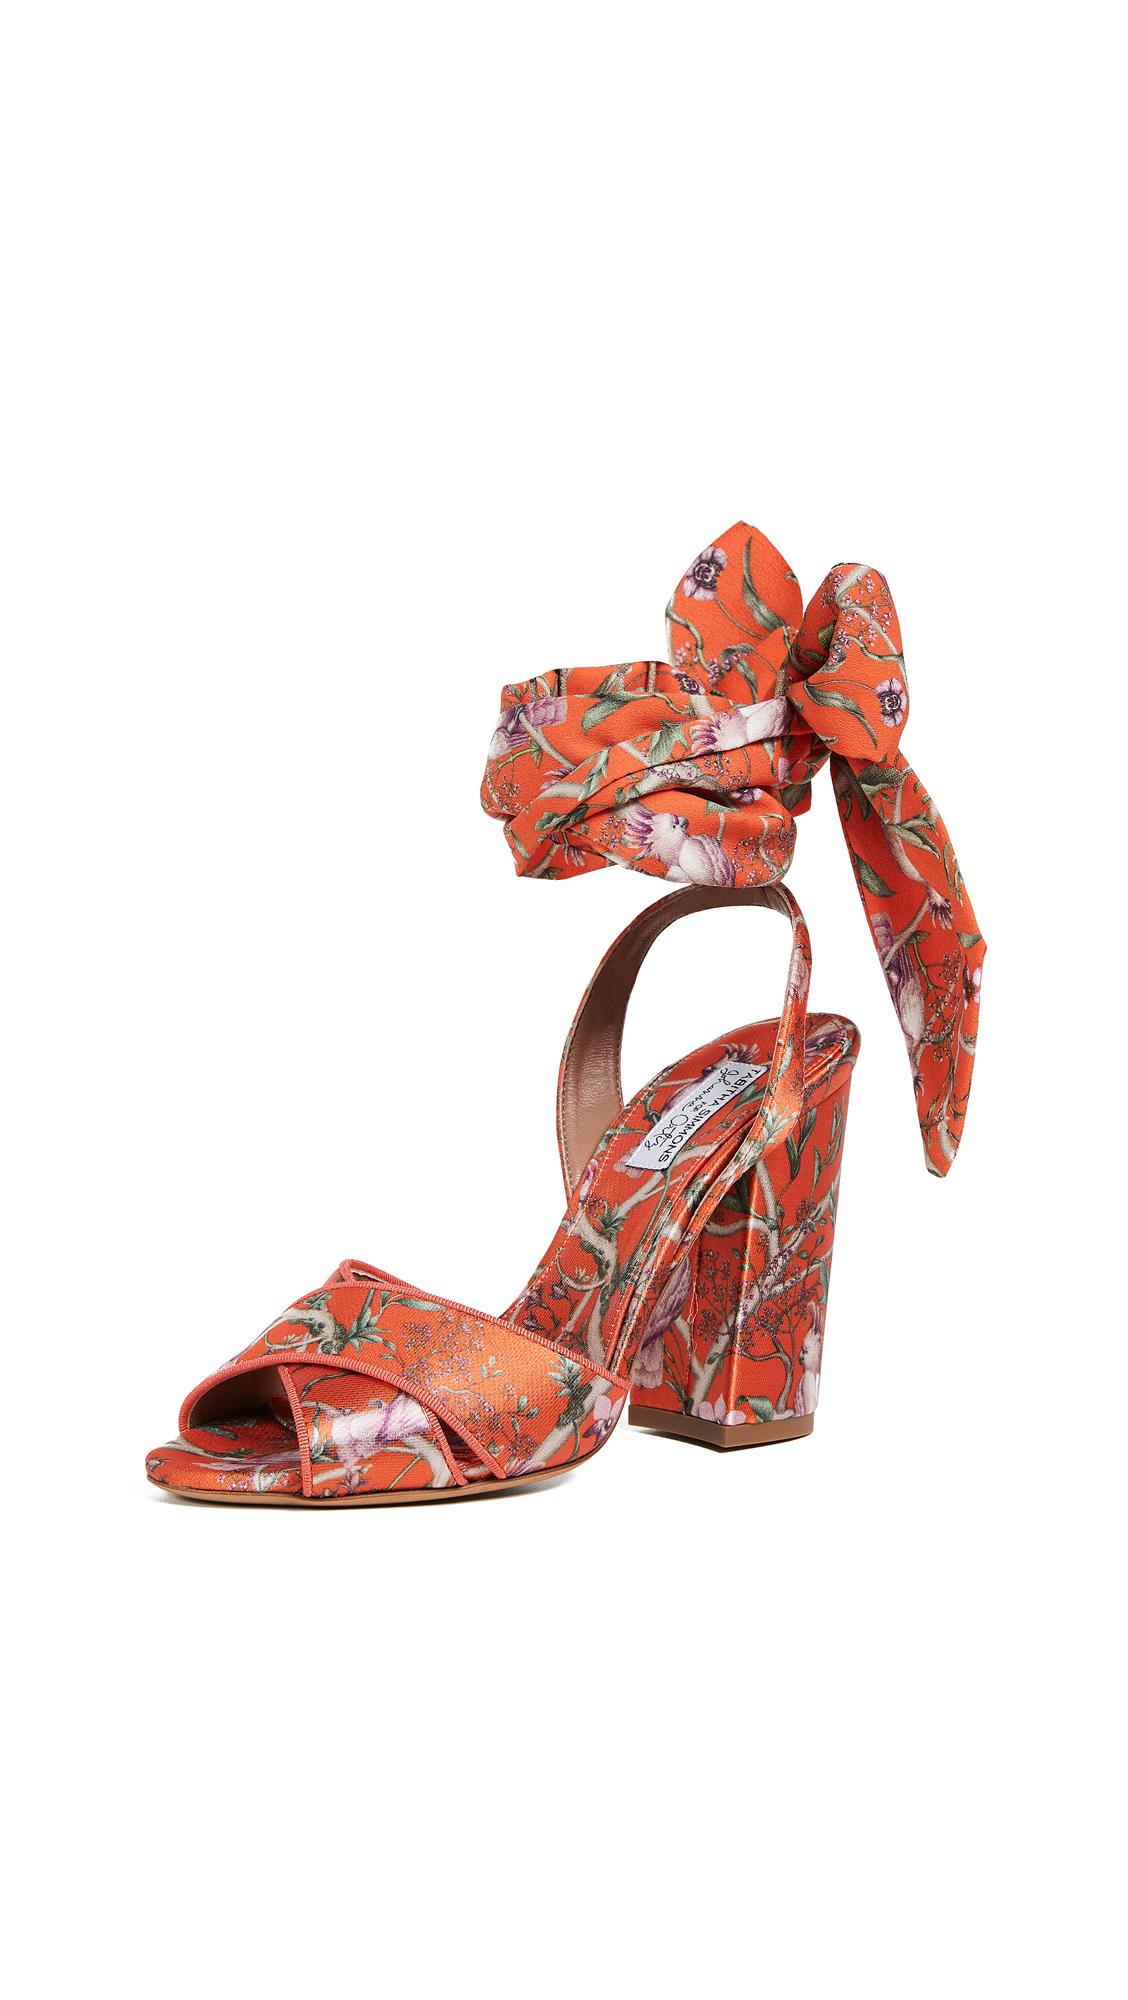 Tabitha Simmons x Johanna Ortiz Connie Wrap Sandals - Red Multi